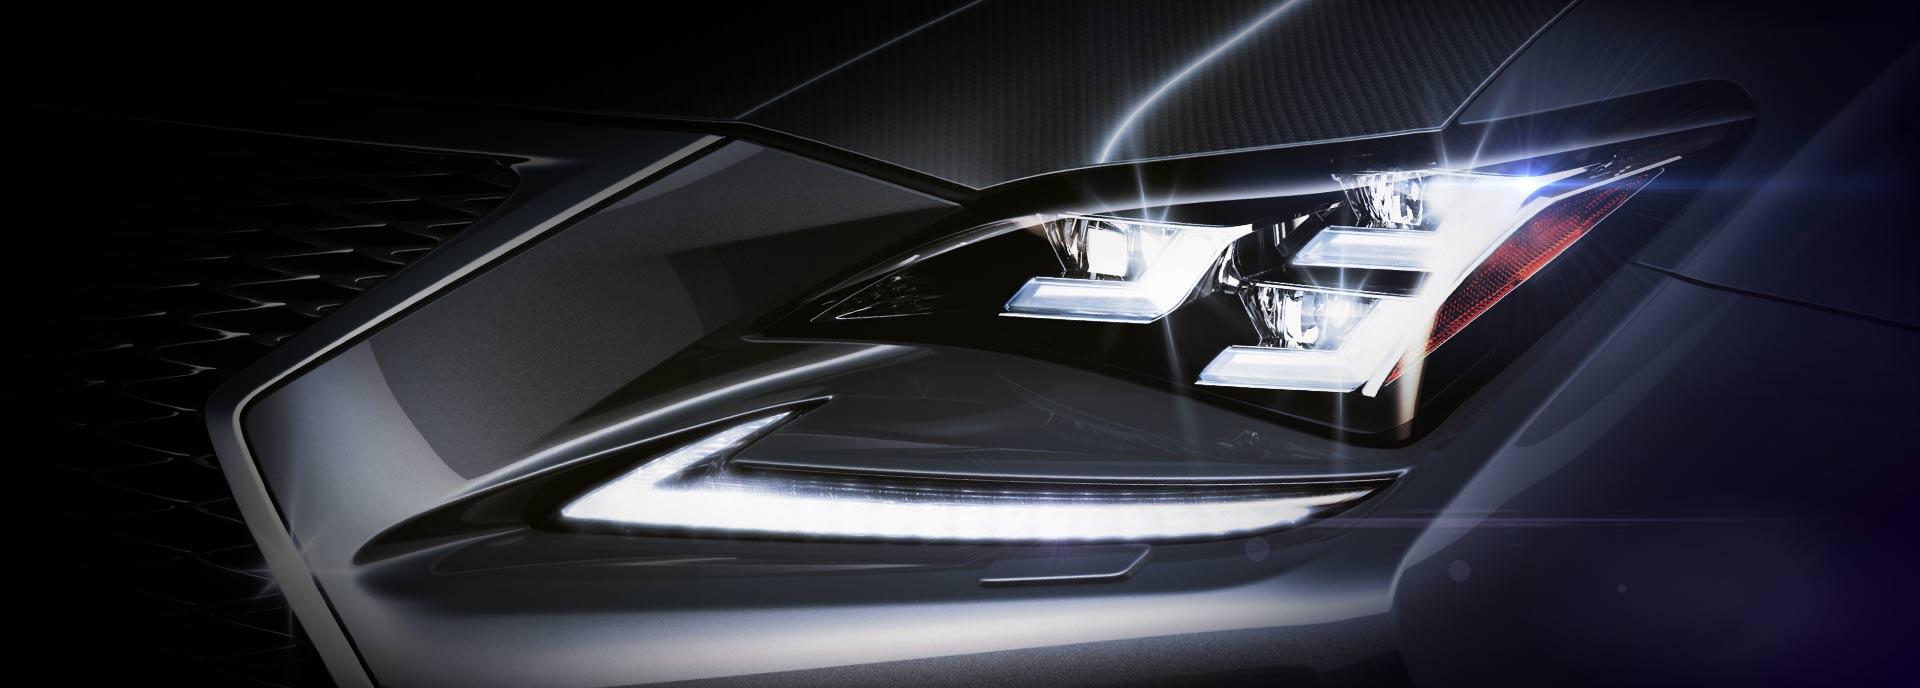 Vista detalle de faro Led delantero del NX 300h color plata